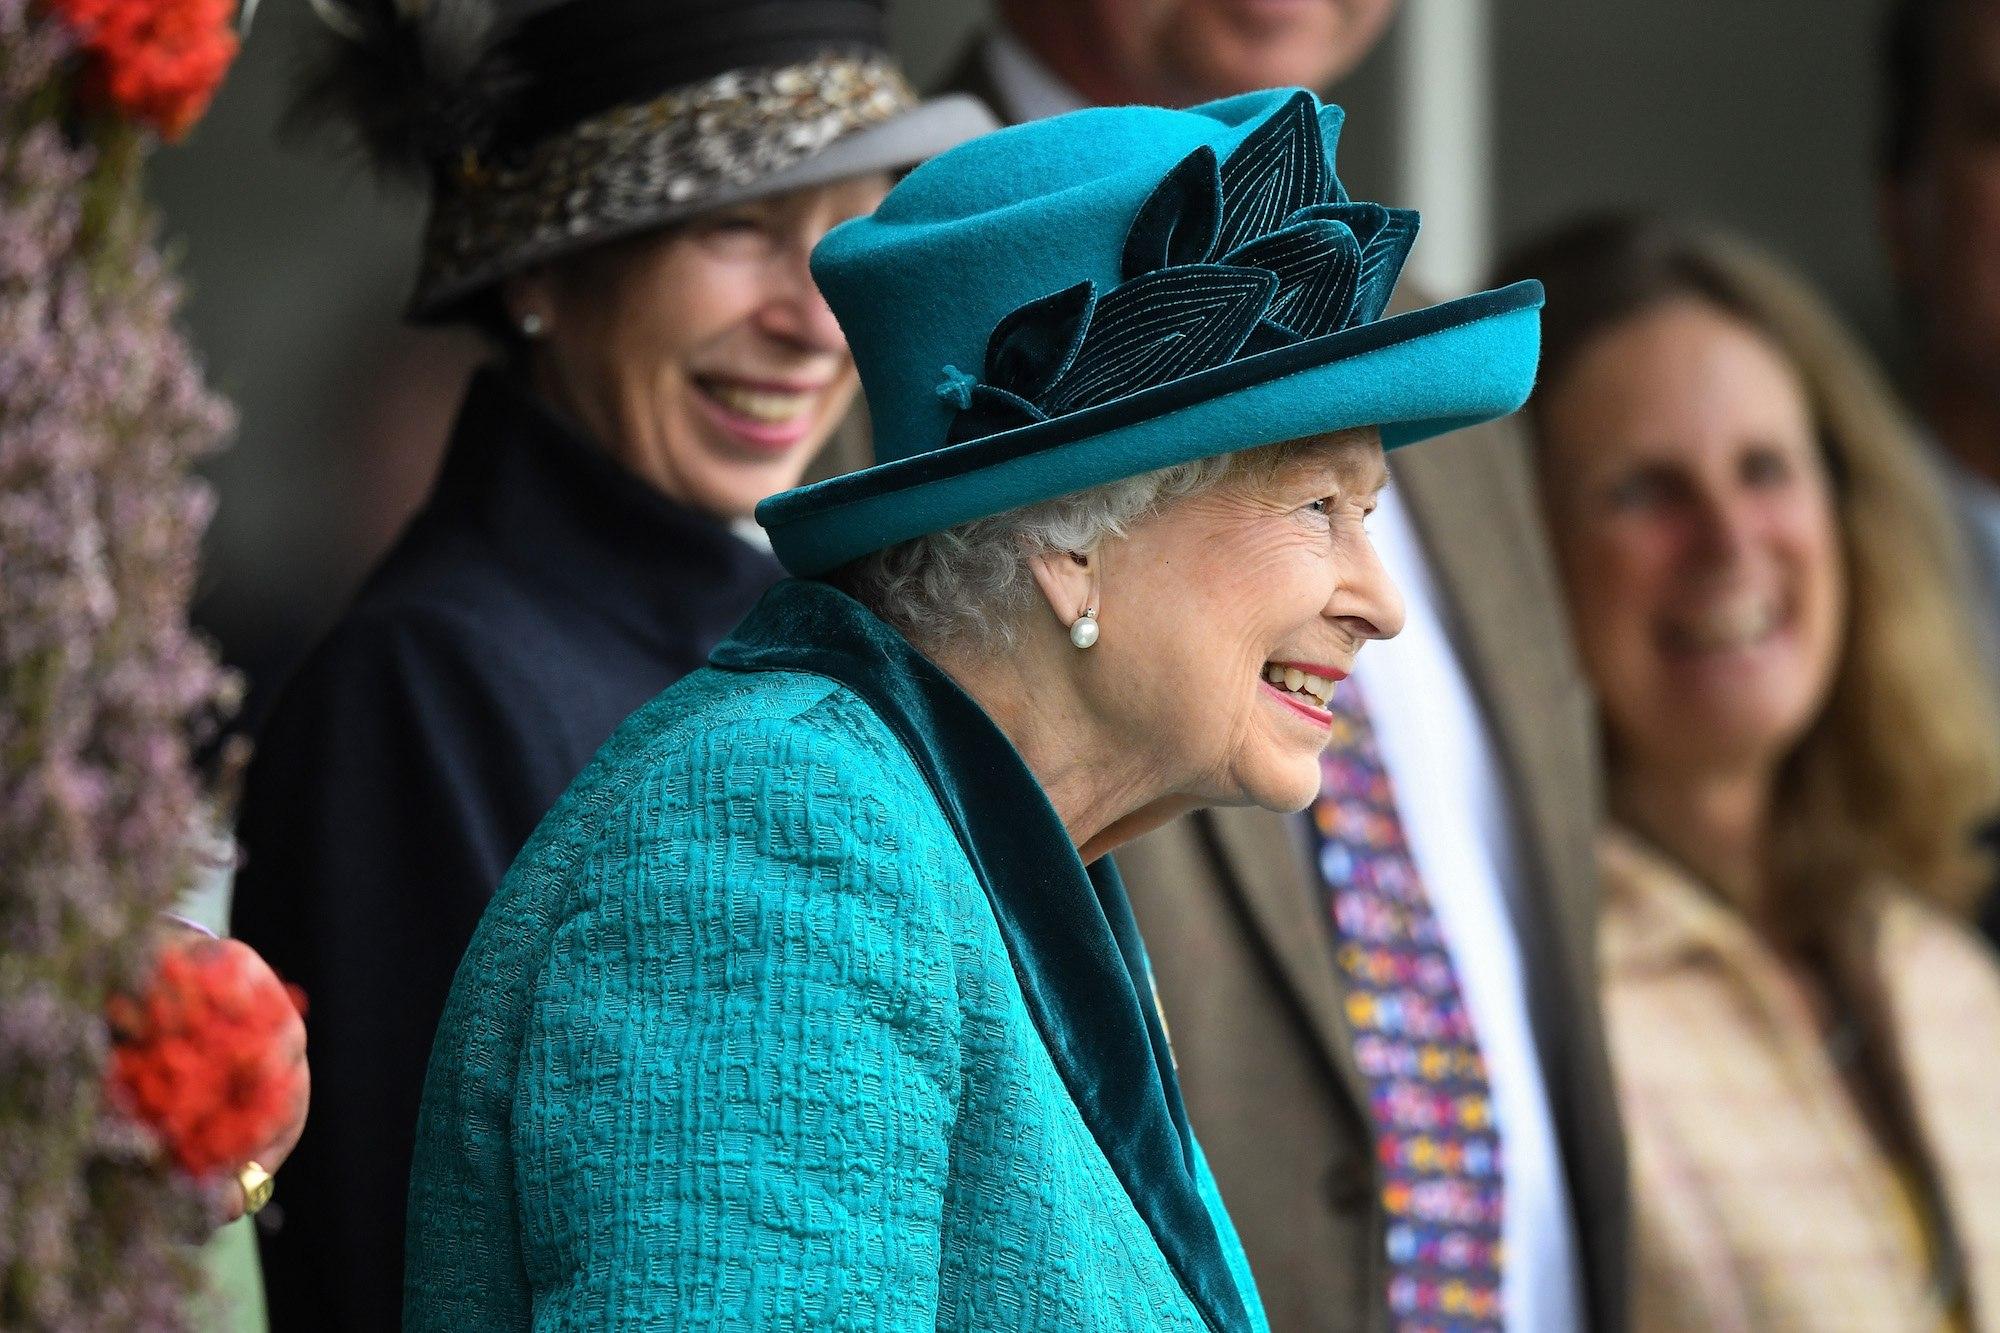 Queen Elizabeth II attends the annual Braemar Highland Gathering in 2018